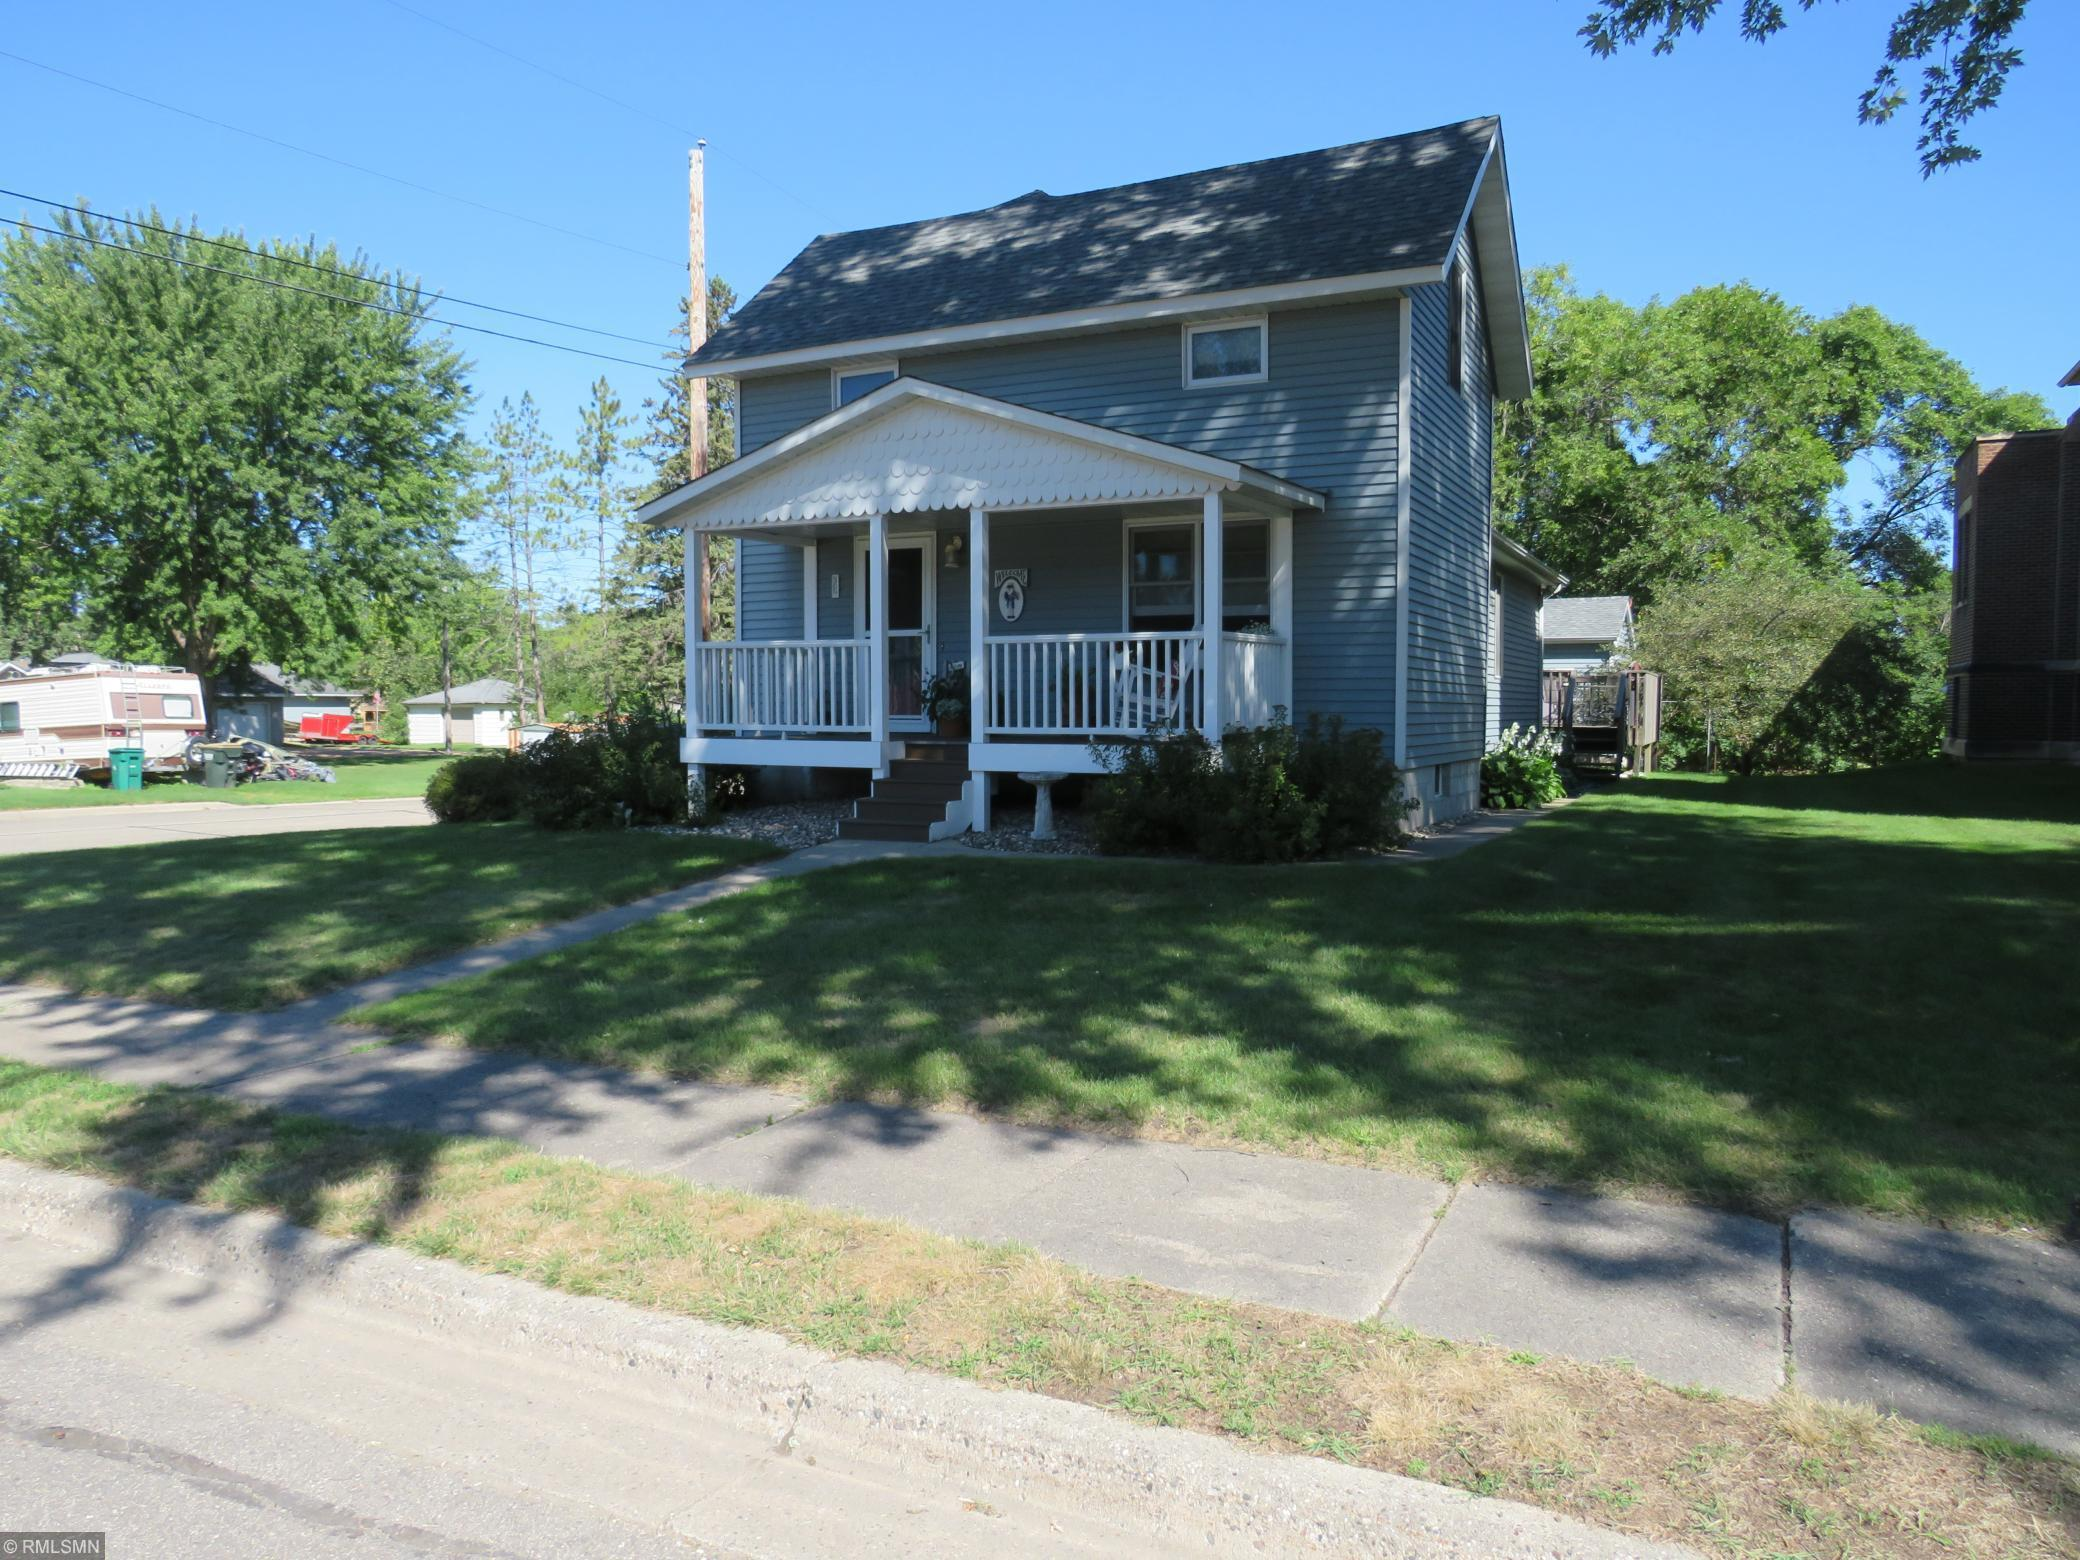 300 1st Street NE Property Photo - Plato, MN real estate listing